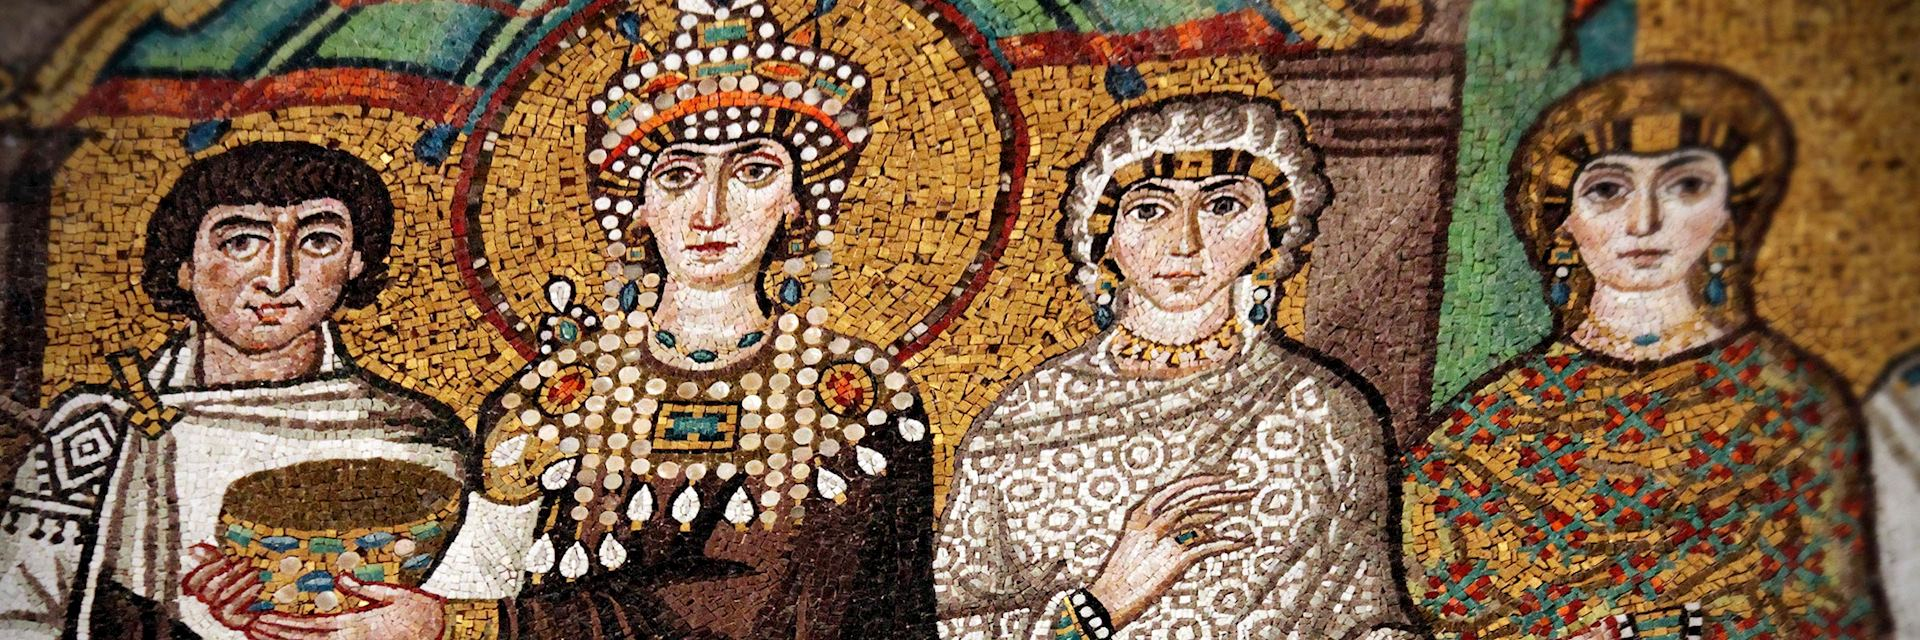 Empress Theodora, Ravenna